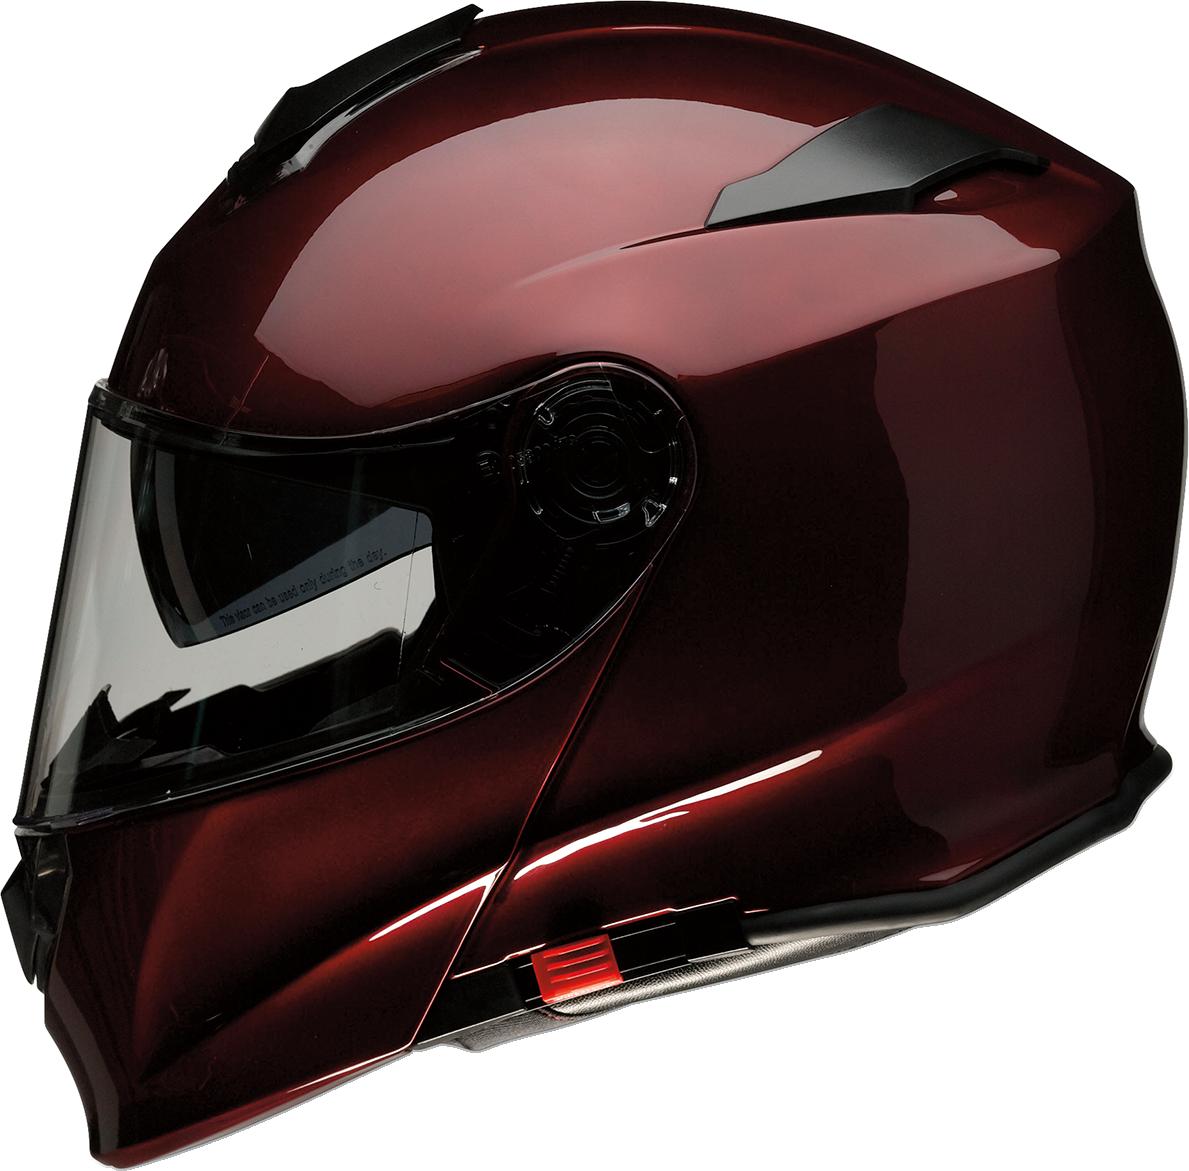 Z1R Solaris Unisex Gloss Wine Red Fullface Modular Motorcycle Riding Helmet